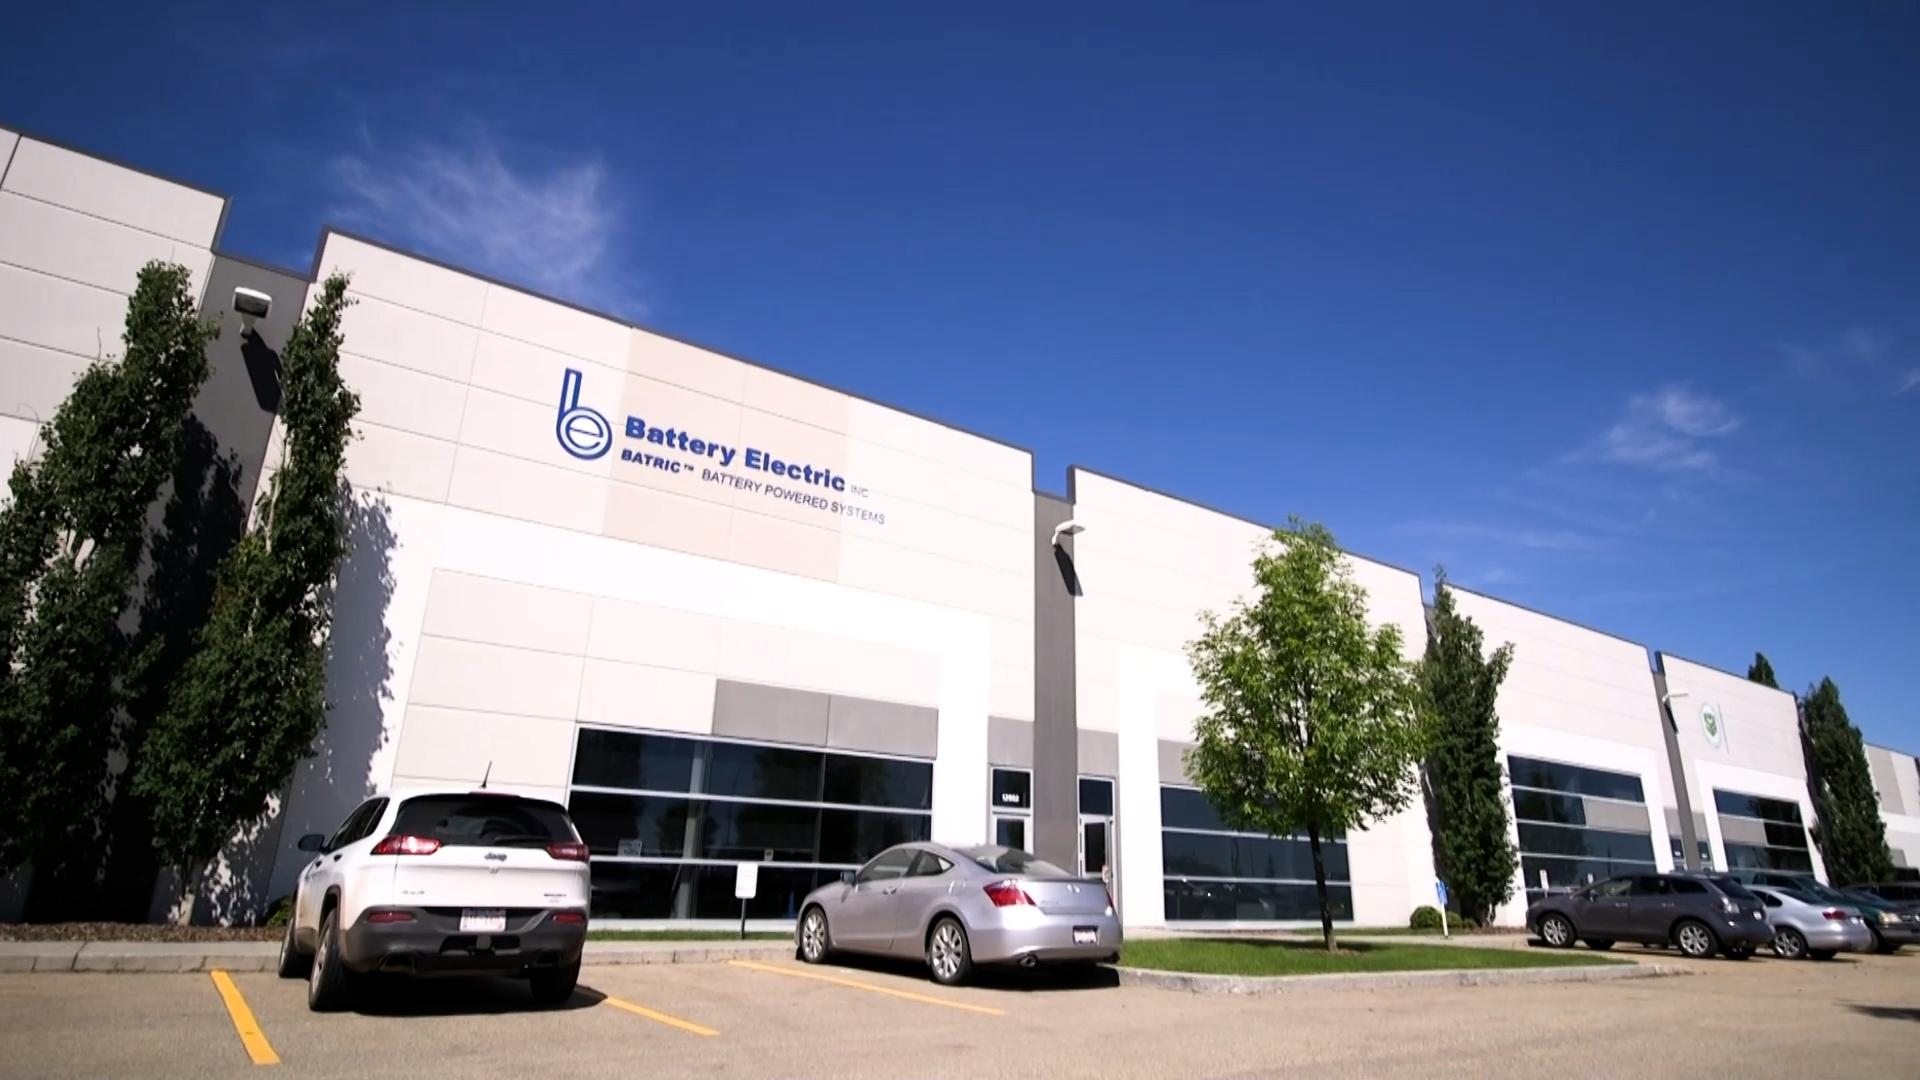 Edmonton Battery Electric Building